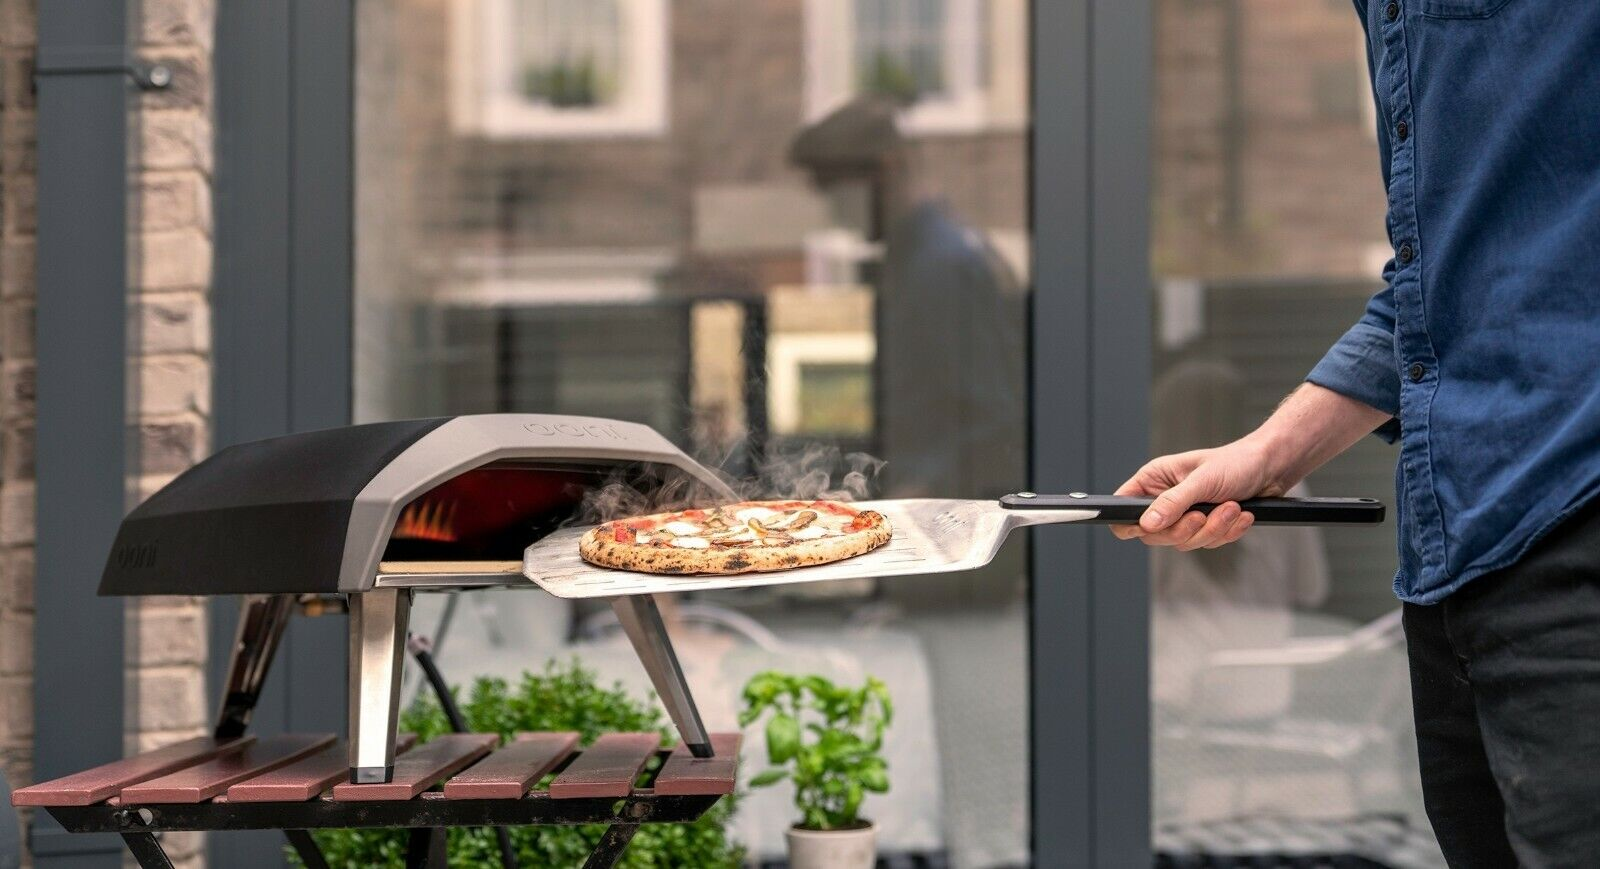 OONI Koda Gas Pizza Oven